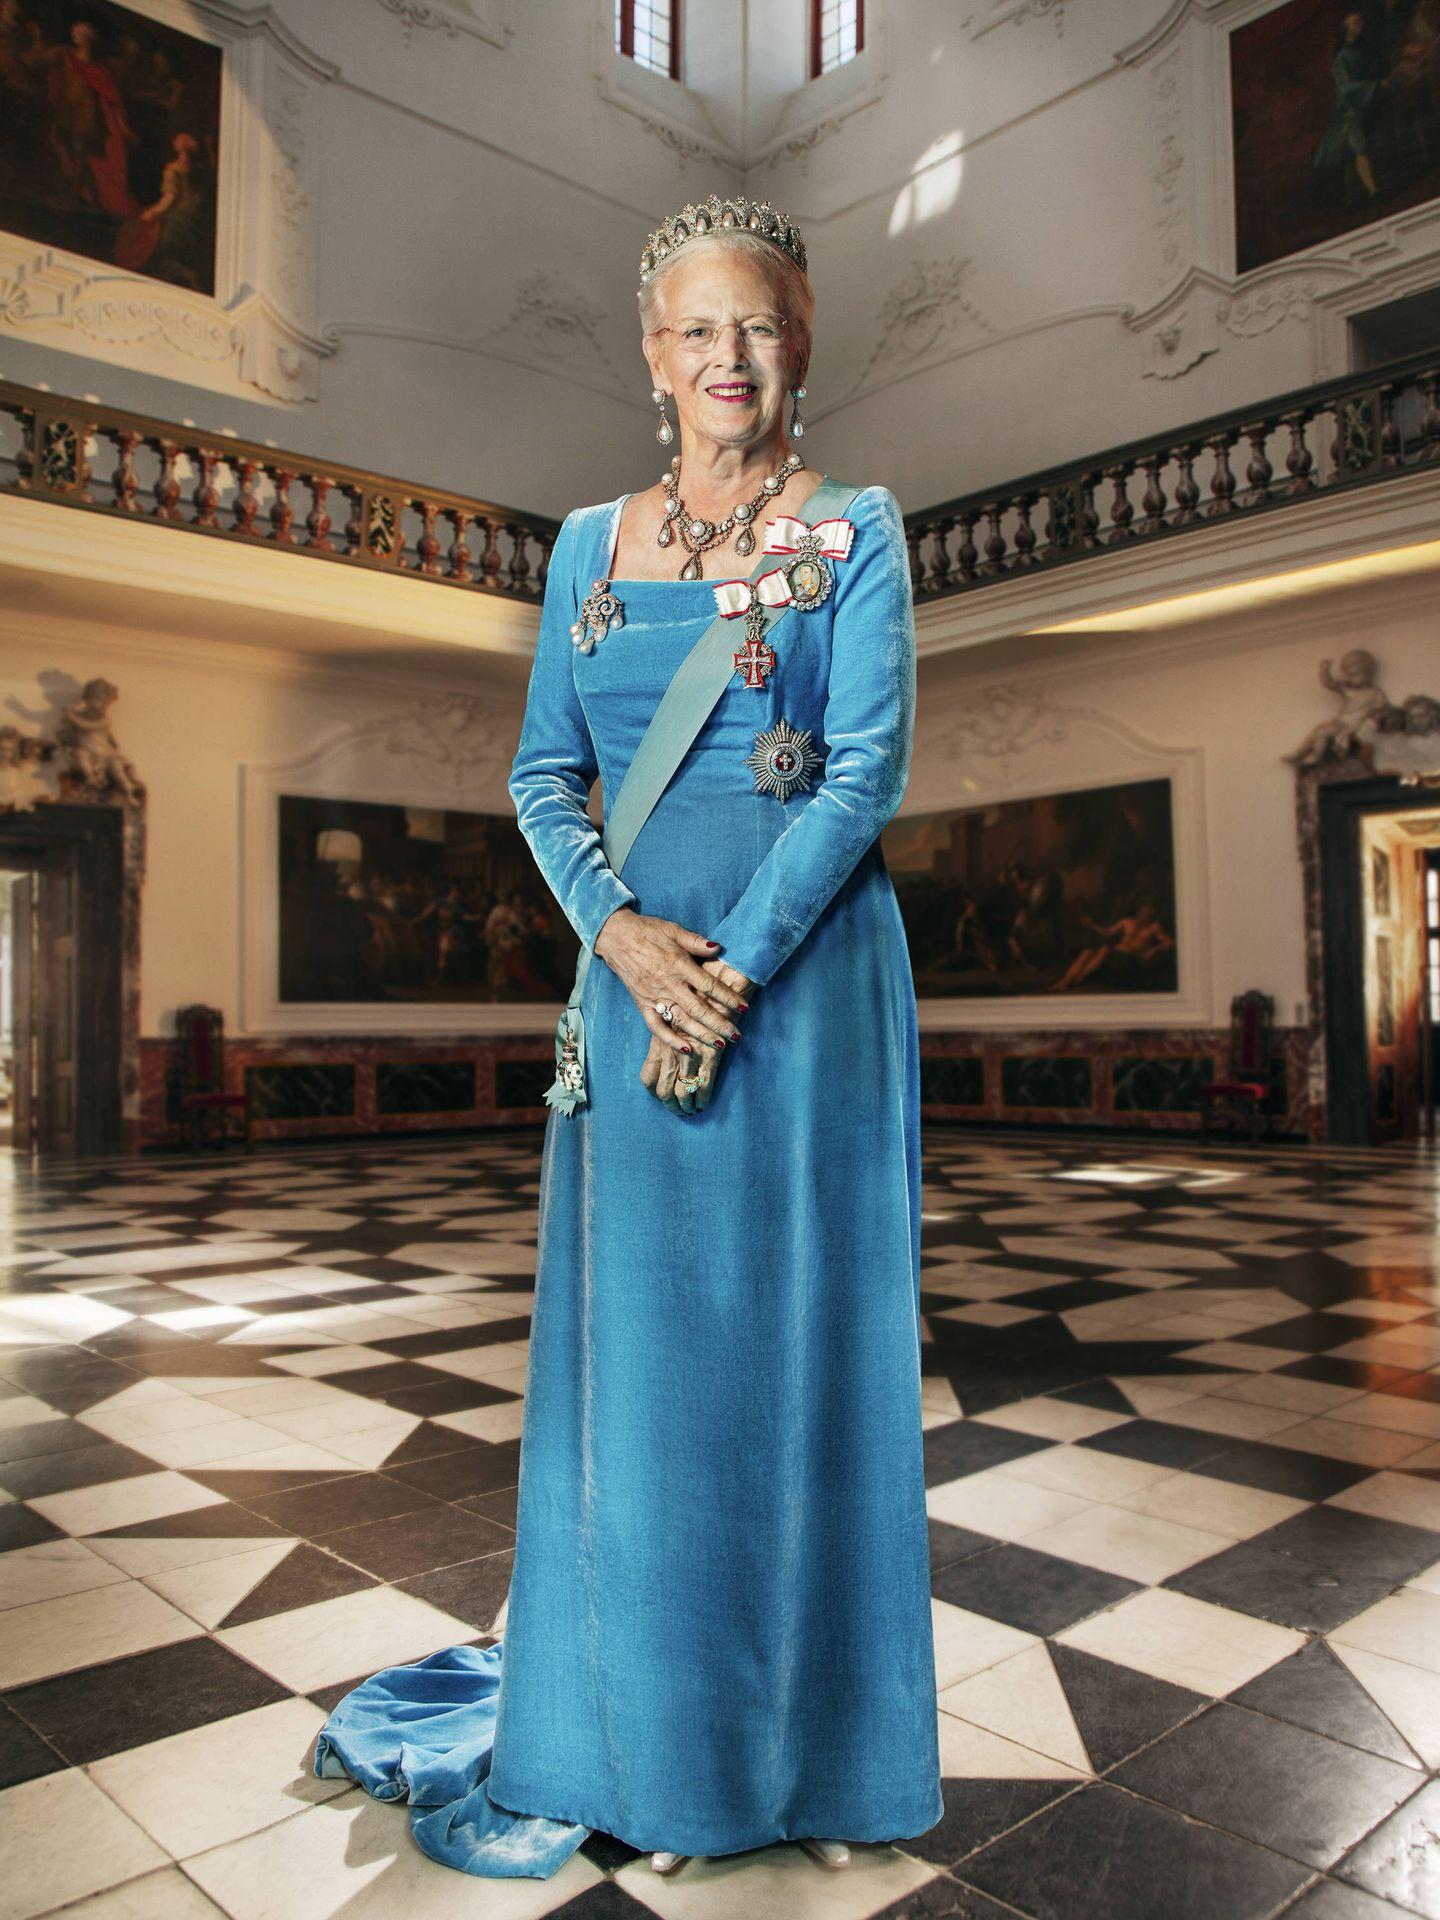 La reina Margarita. (Pet Morten Abrahamsen / Casa Real)